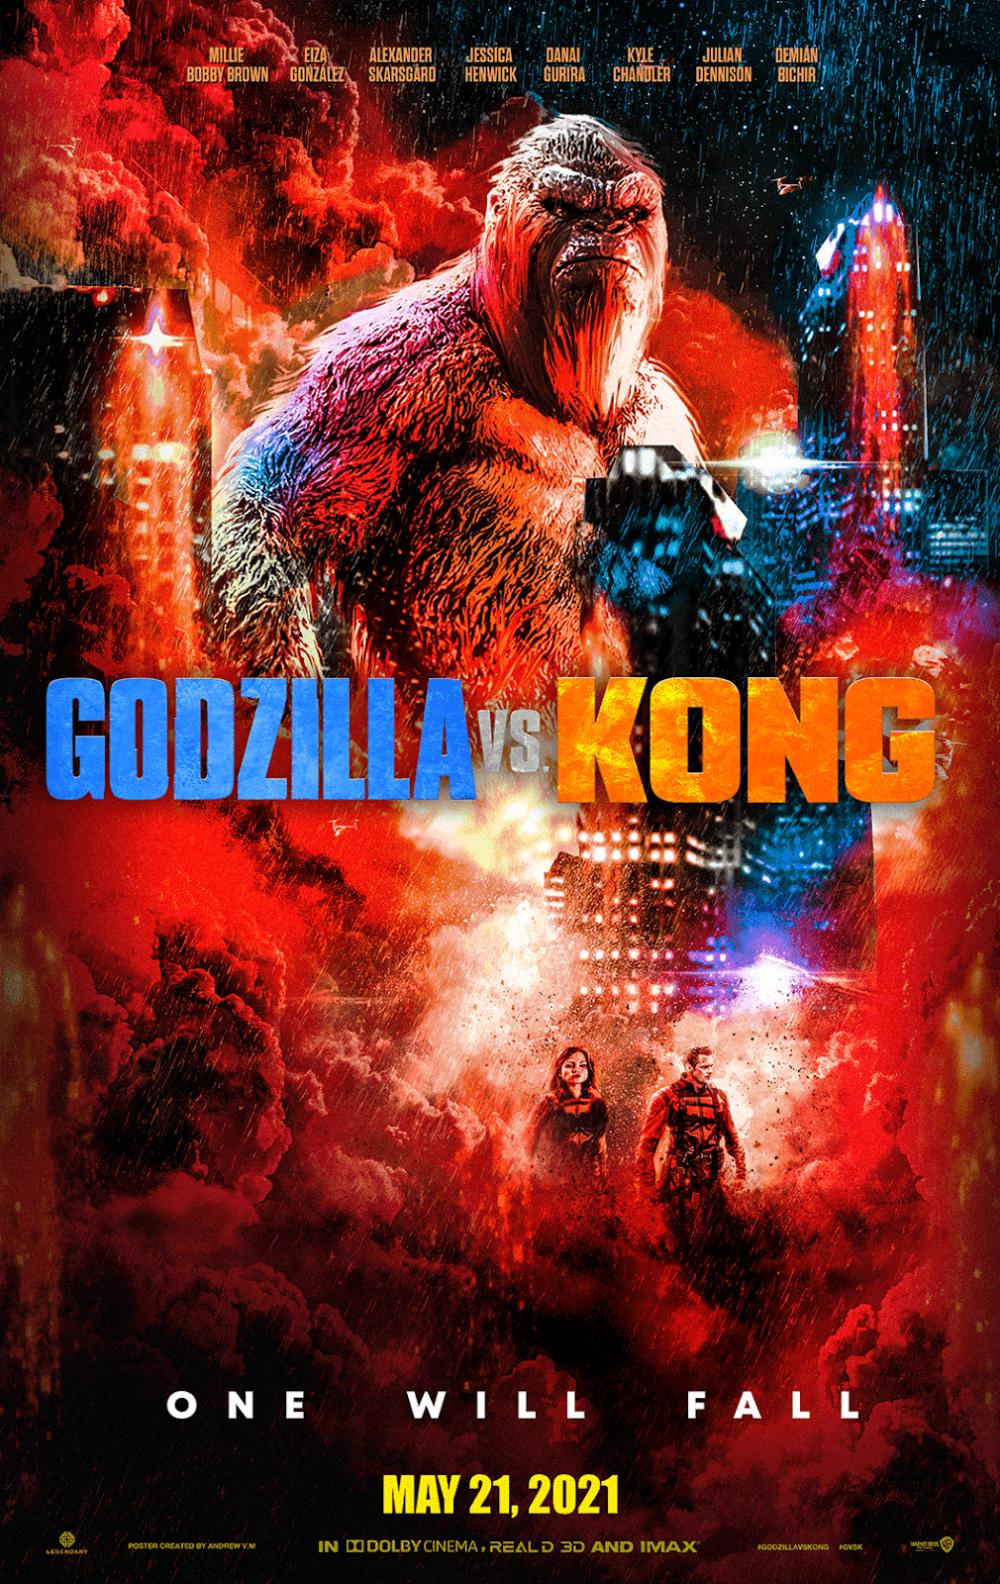 20 Andrew Vm Andrewv M Twitter In 2021 King Kong Vs Godzilla King Kong Art Godzilla